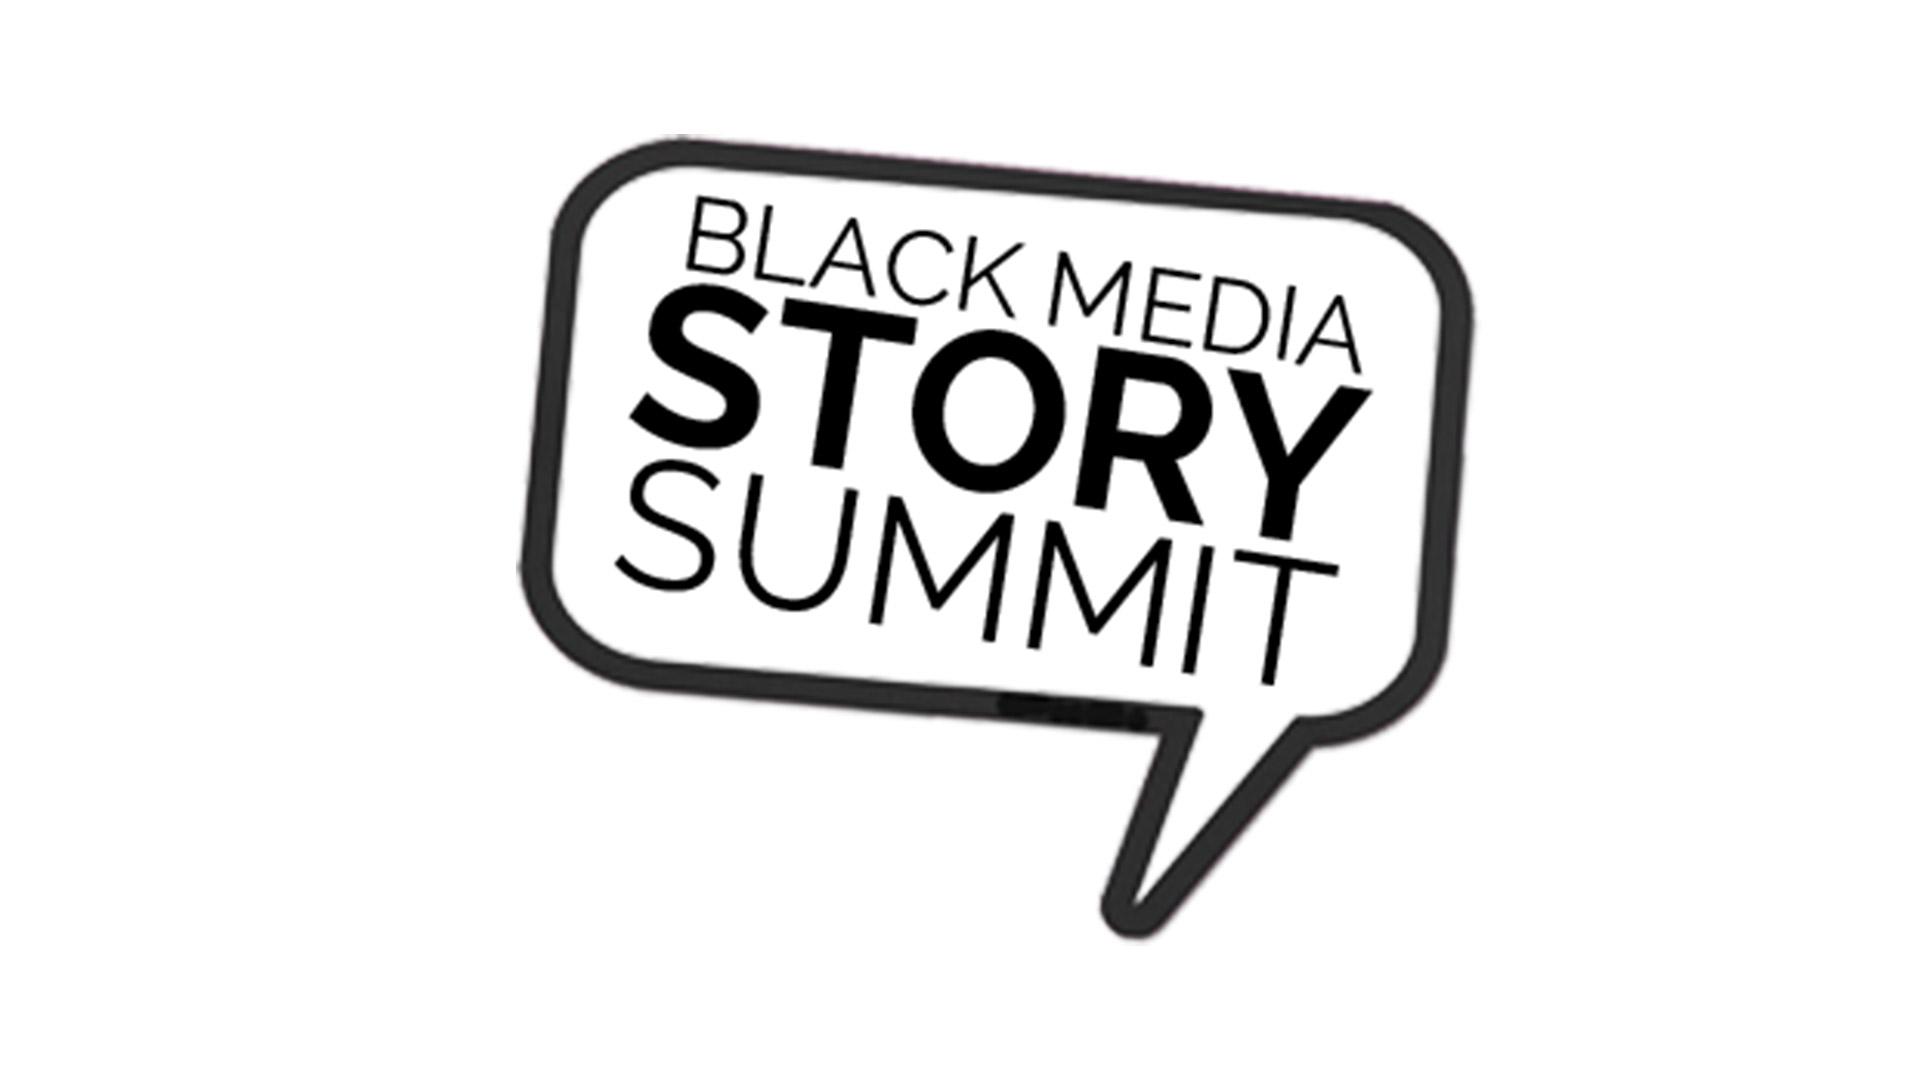 Black Media Story Summit_logo_1920x1080